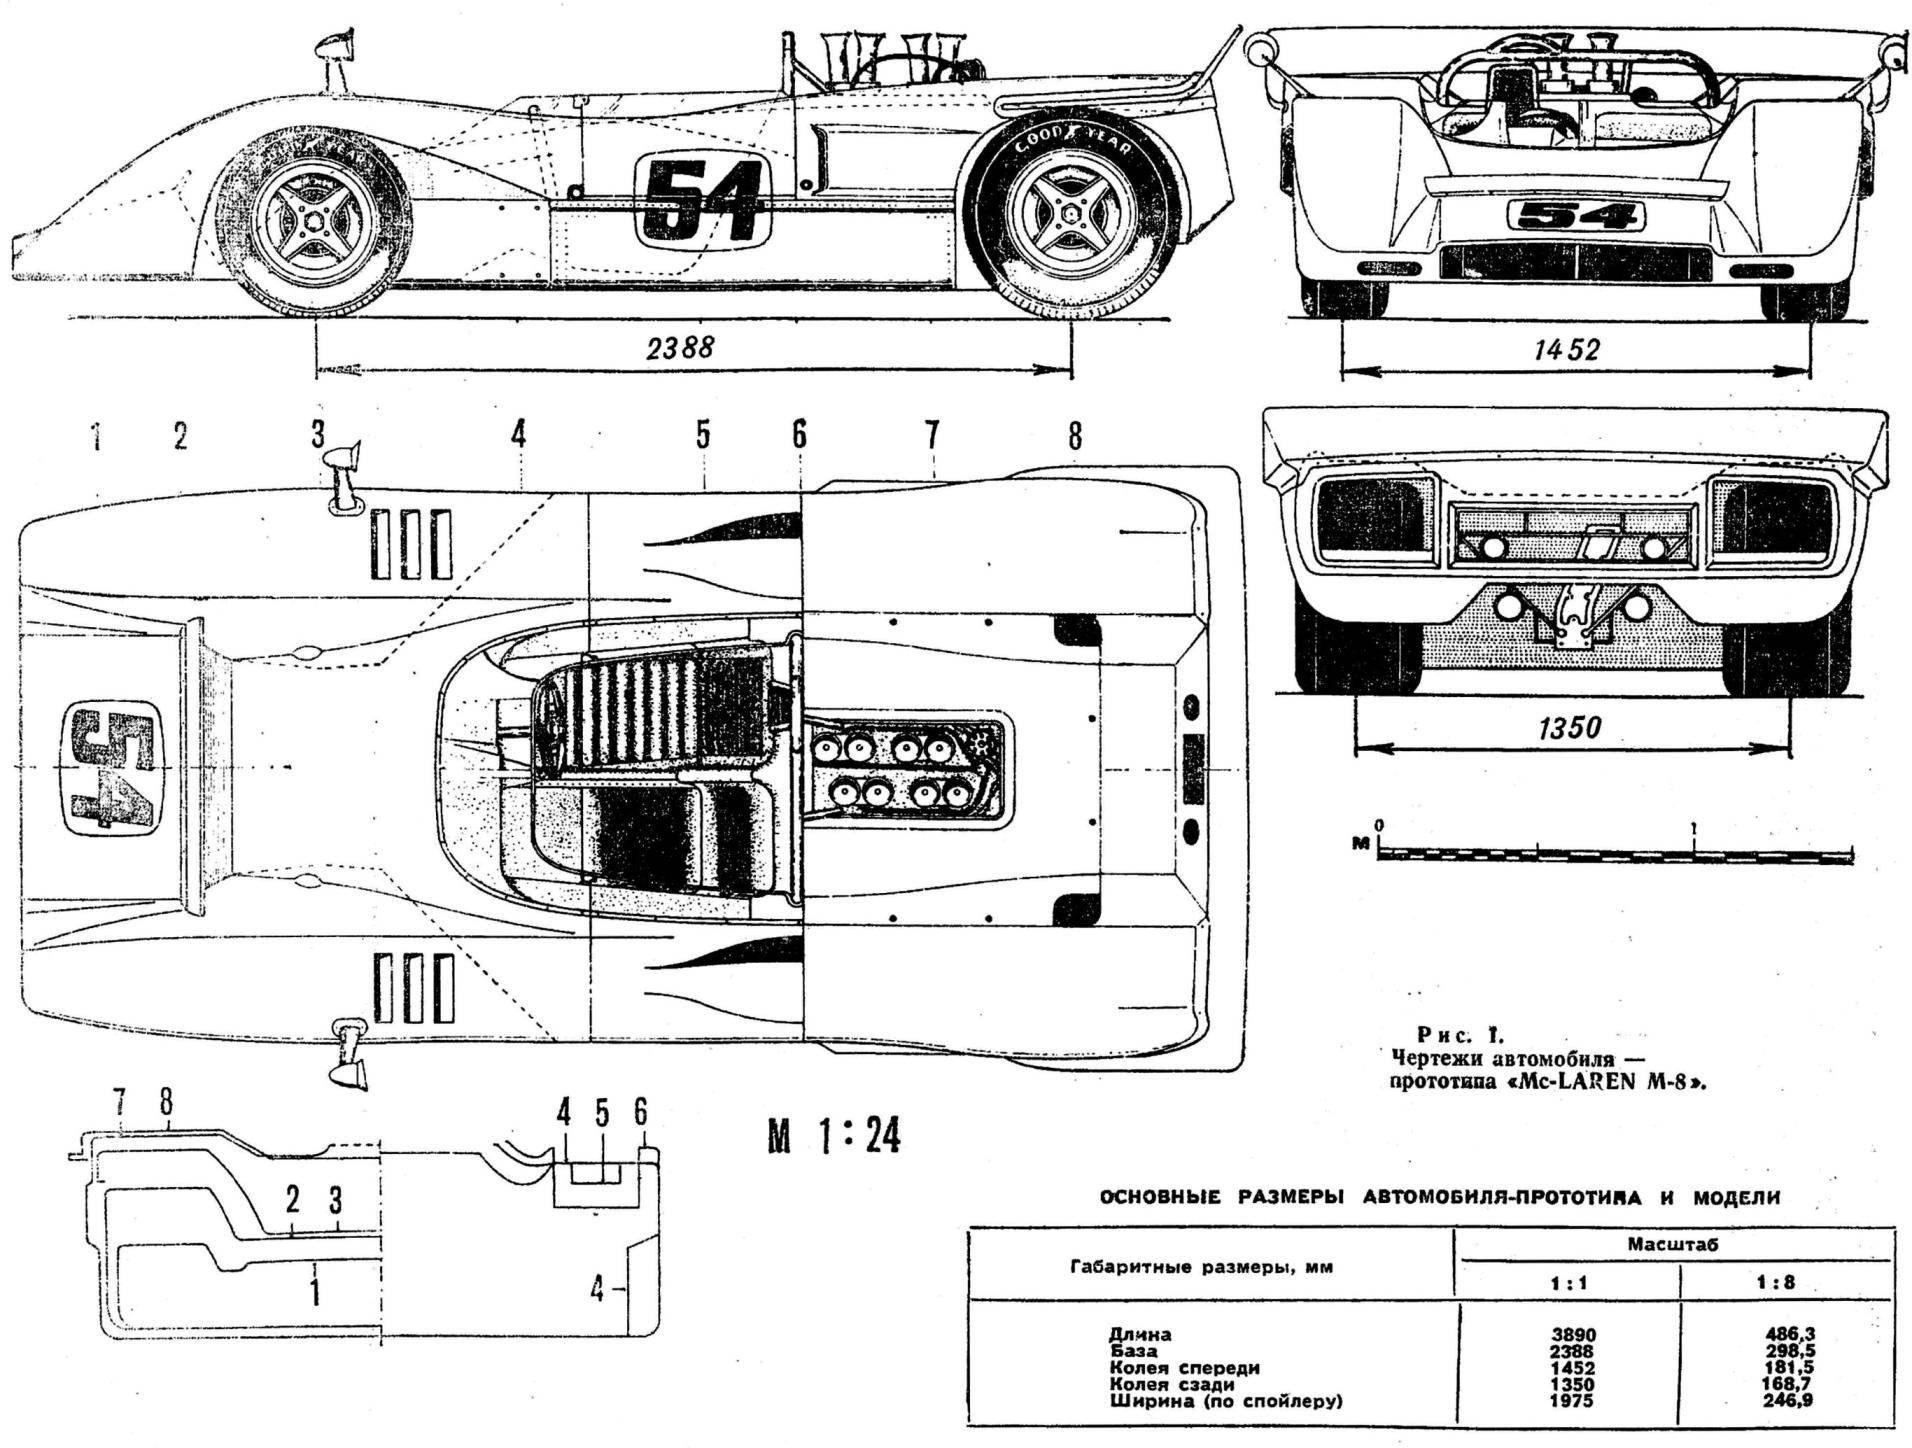 Рис. 1. Чертежи автомобиля — прототипа «Mc-LAREN М-8».